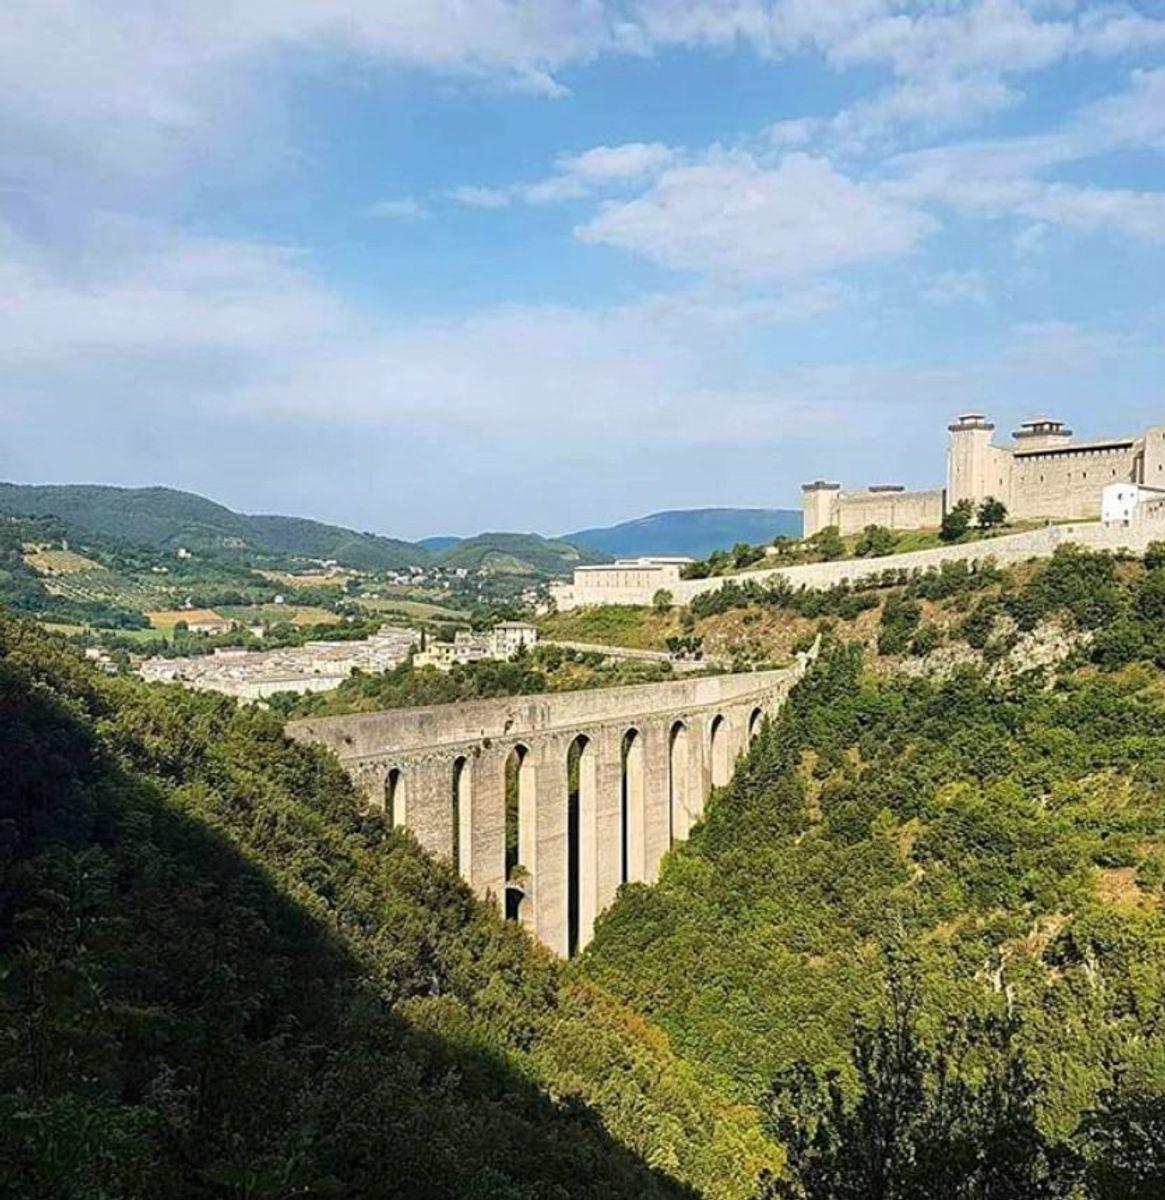 event-L'Antica Ferrovia Spoleto-Norcia: Il Gottardo Umbro